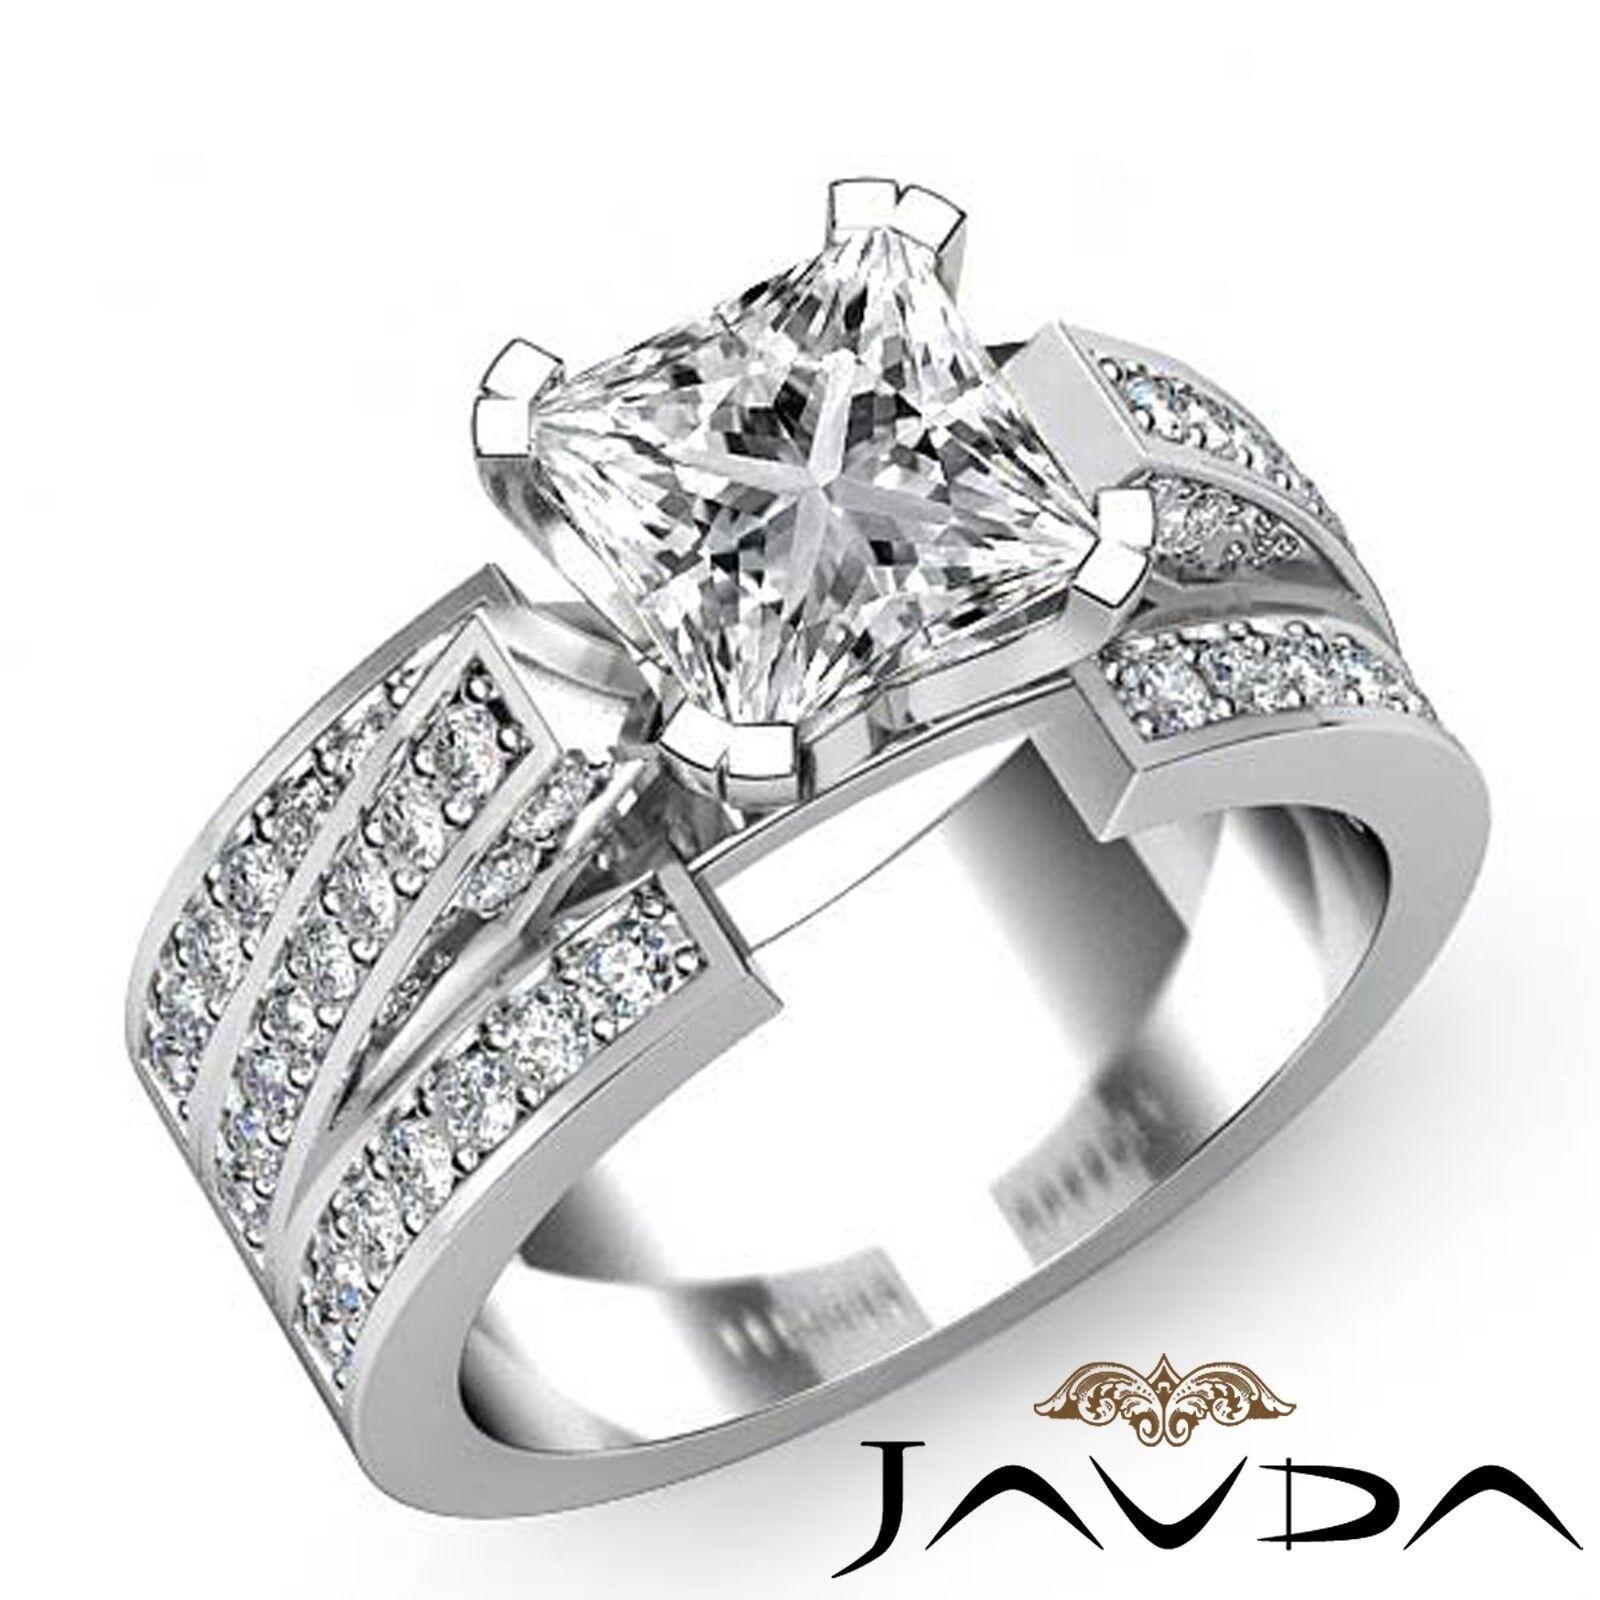 2.26ct Trio Shank Pave Set Princess Diamond Engagement Ring GIA G-VS2 White Gold